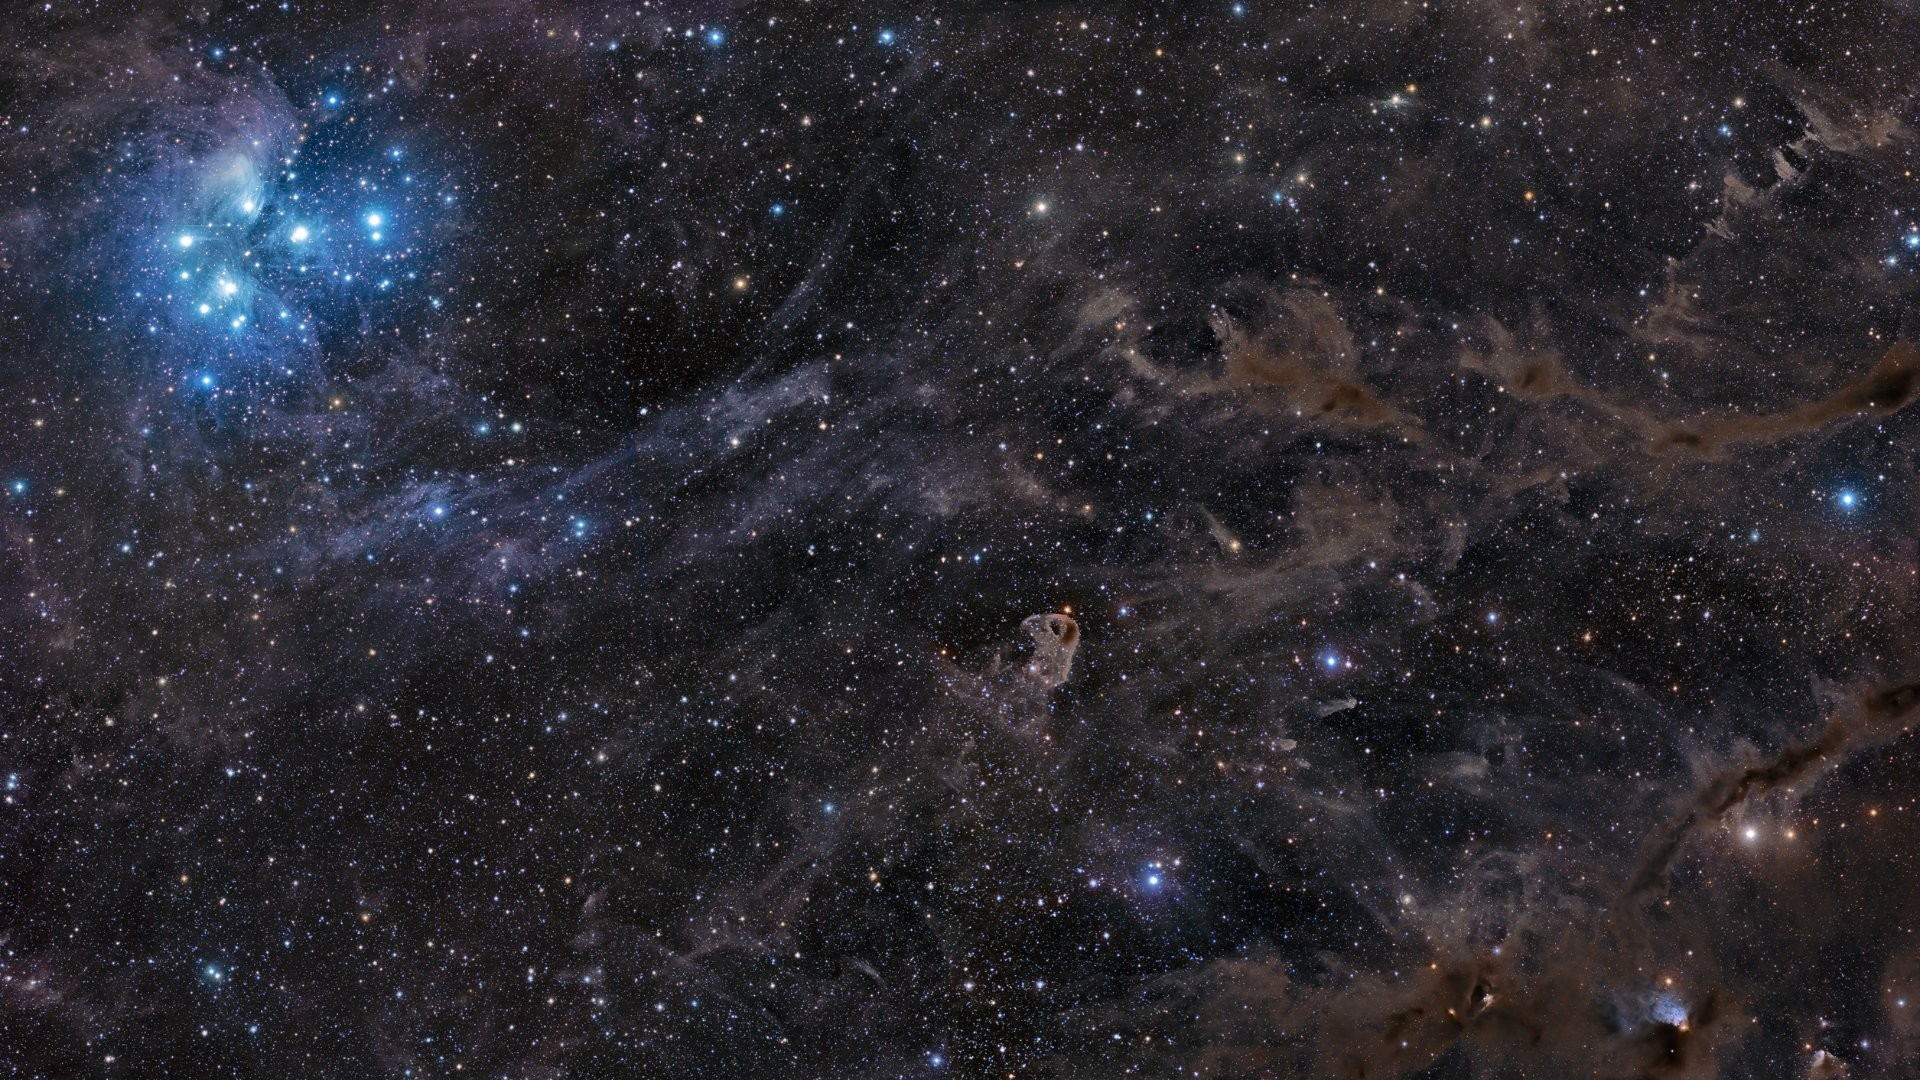 Deep space wallpaper Wallpaper Wide HD 1920x1080